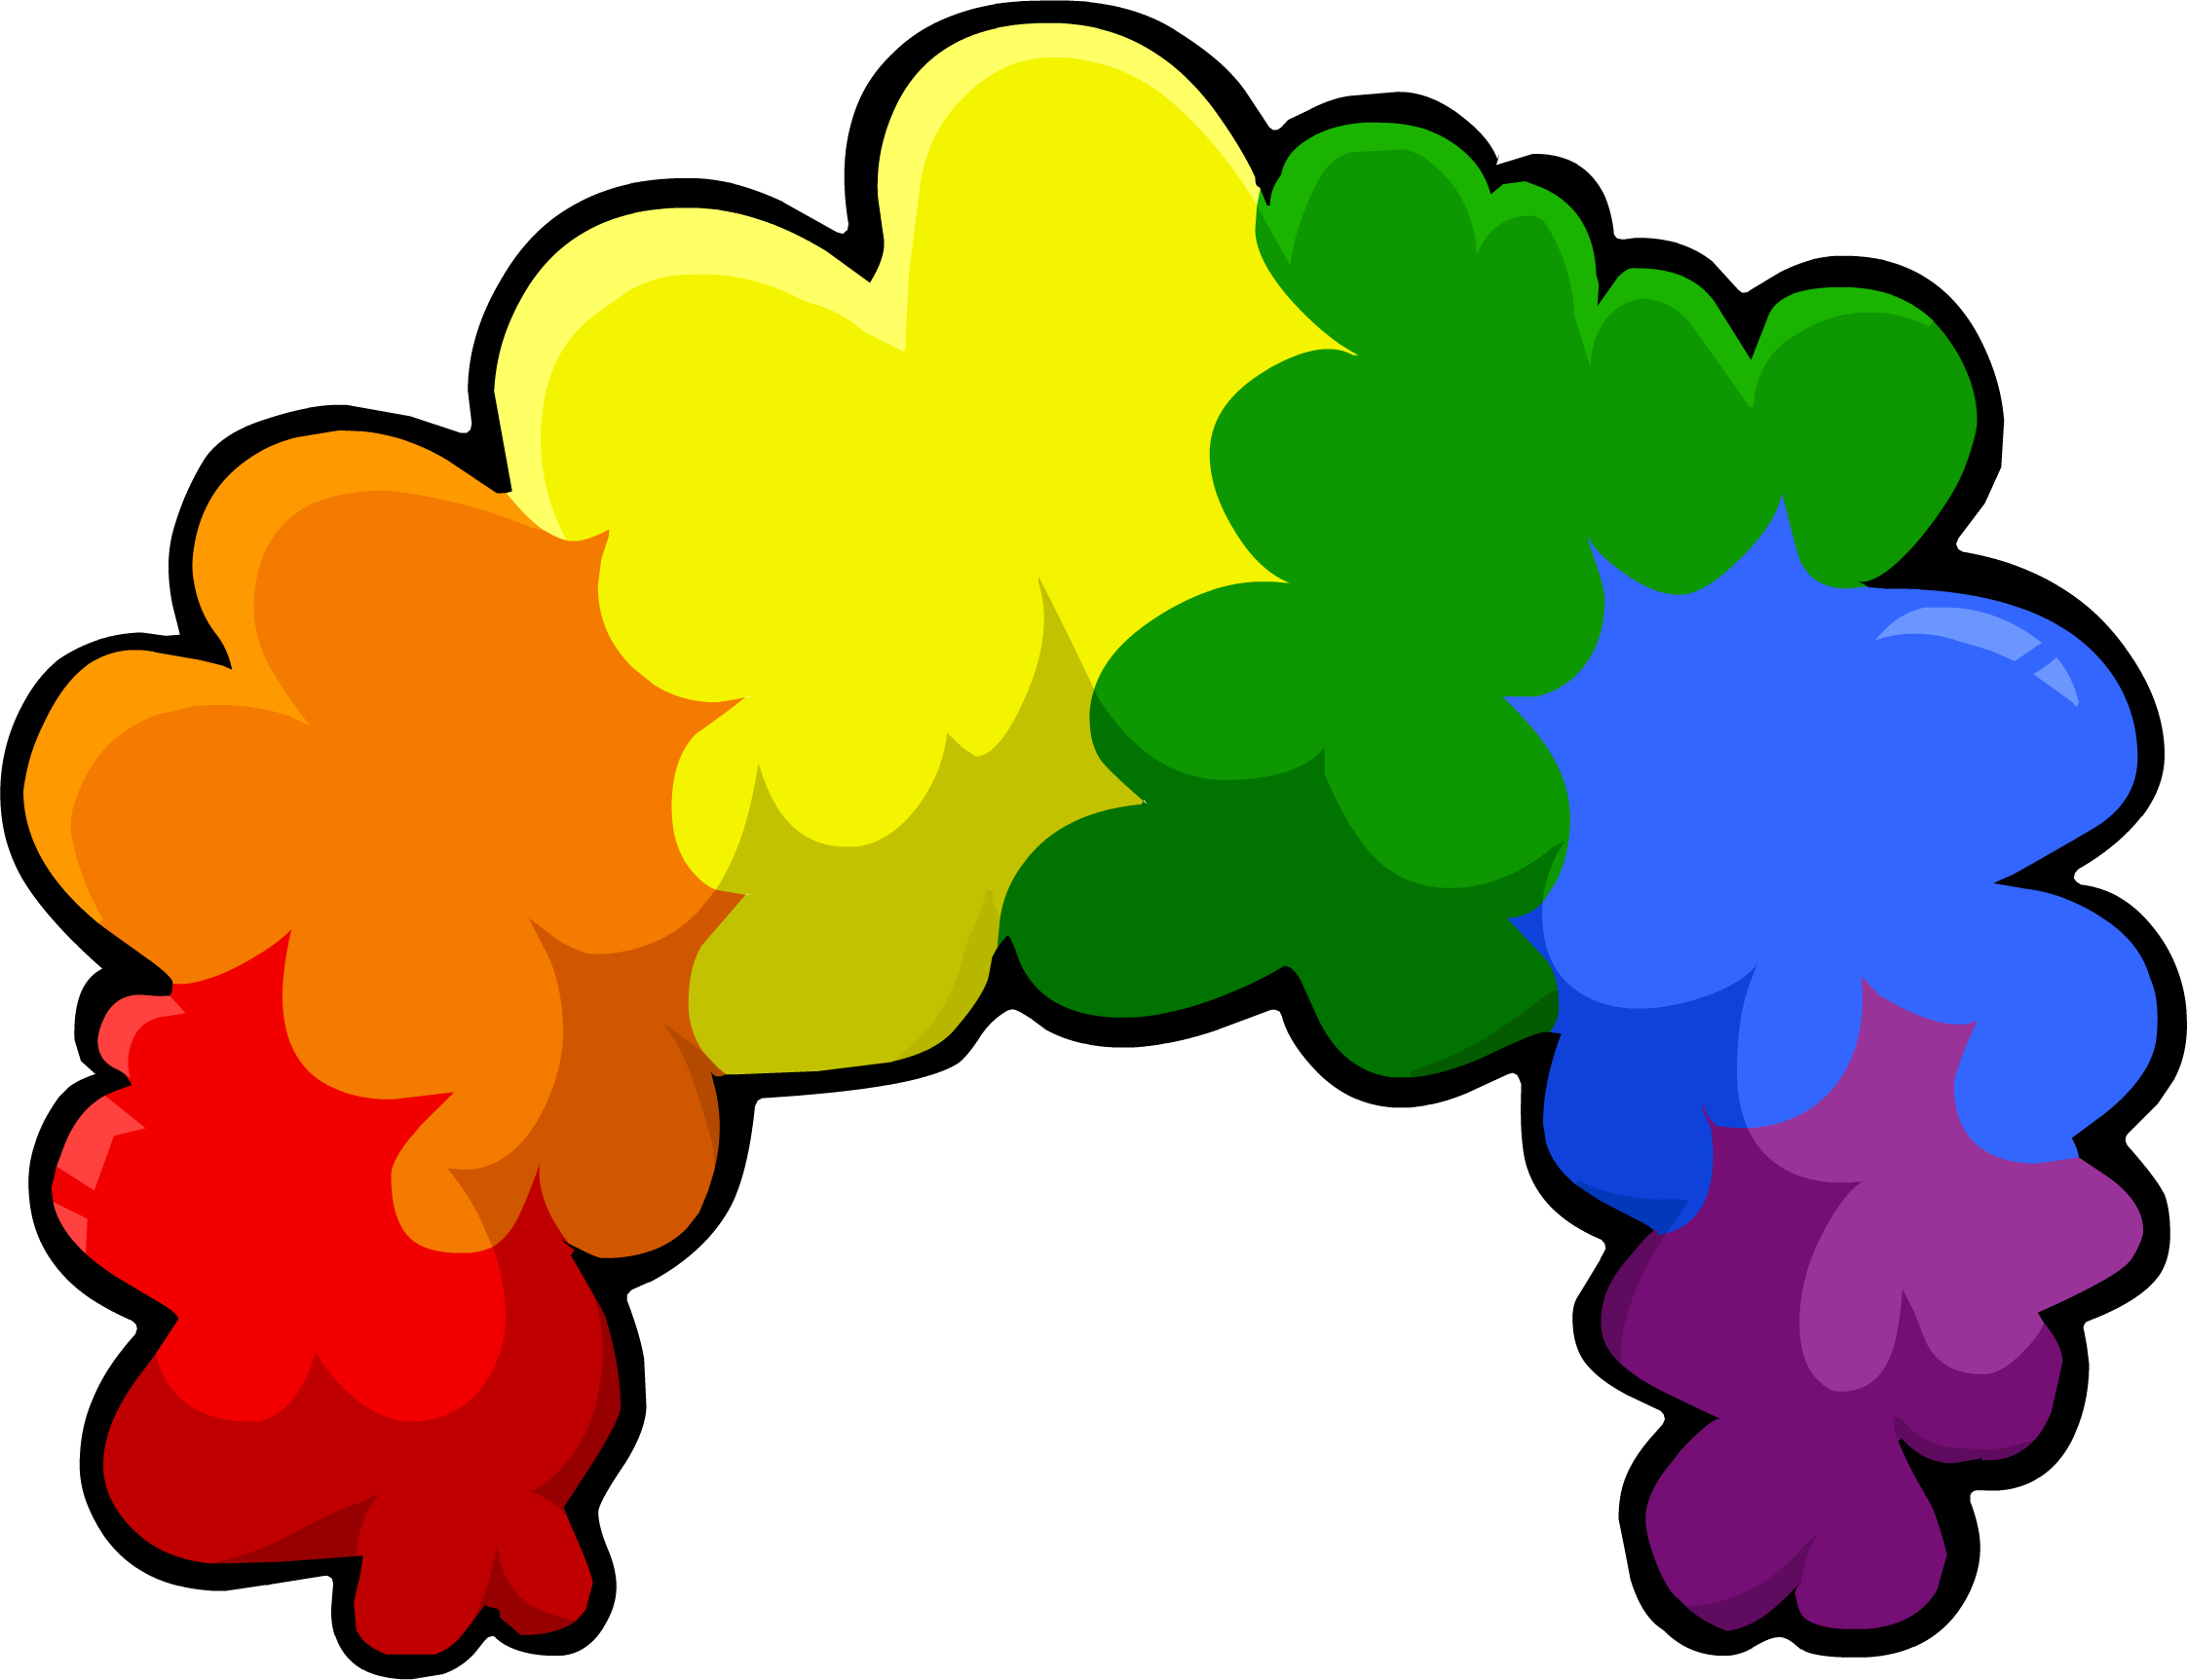 Rainbow fro club penguin. Costume clipart clown wig